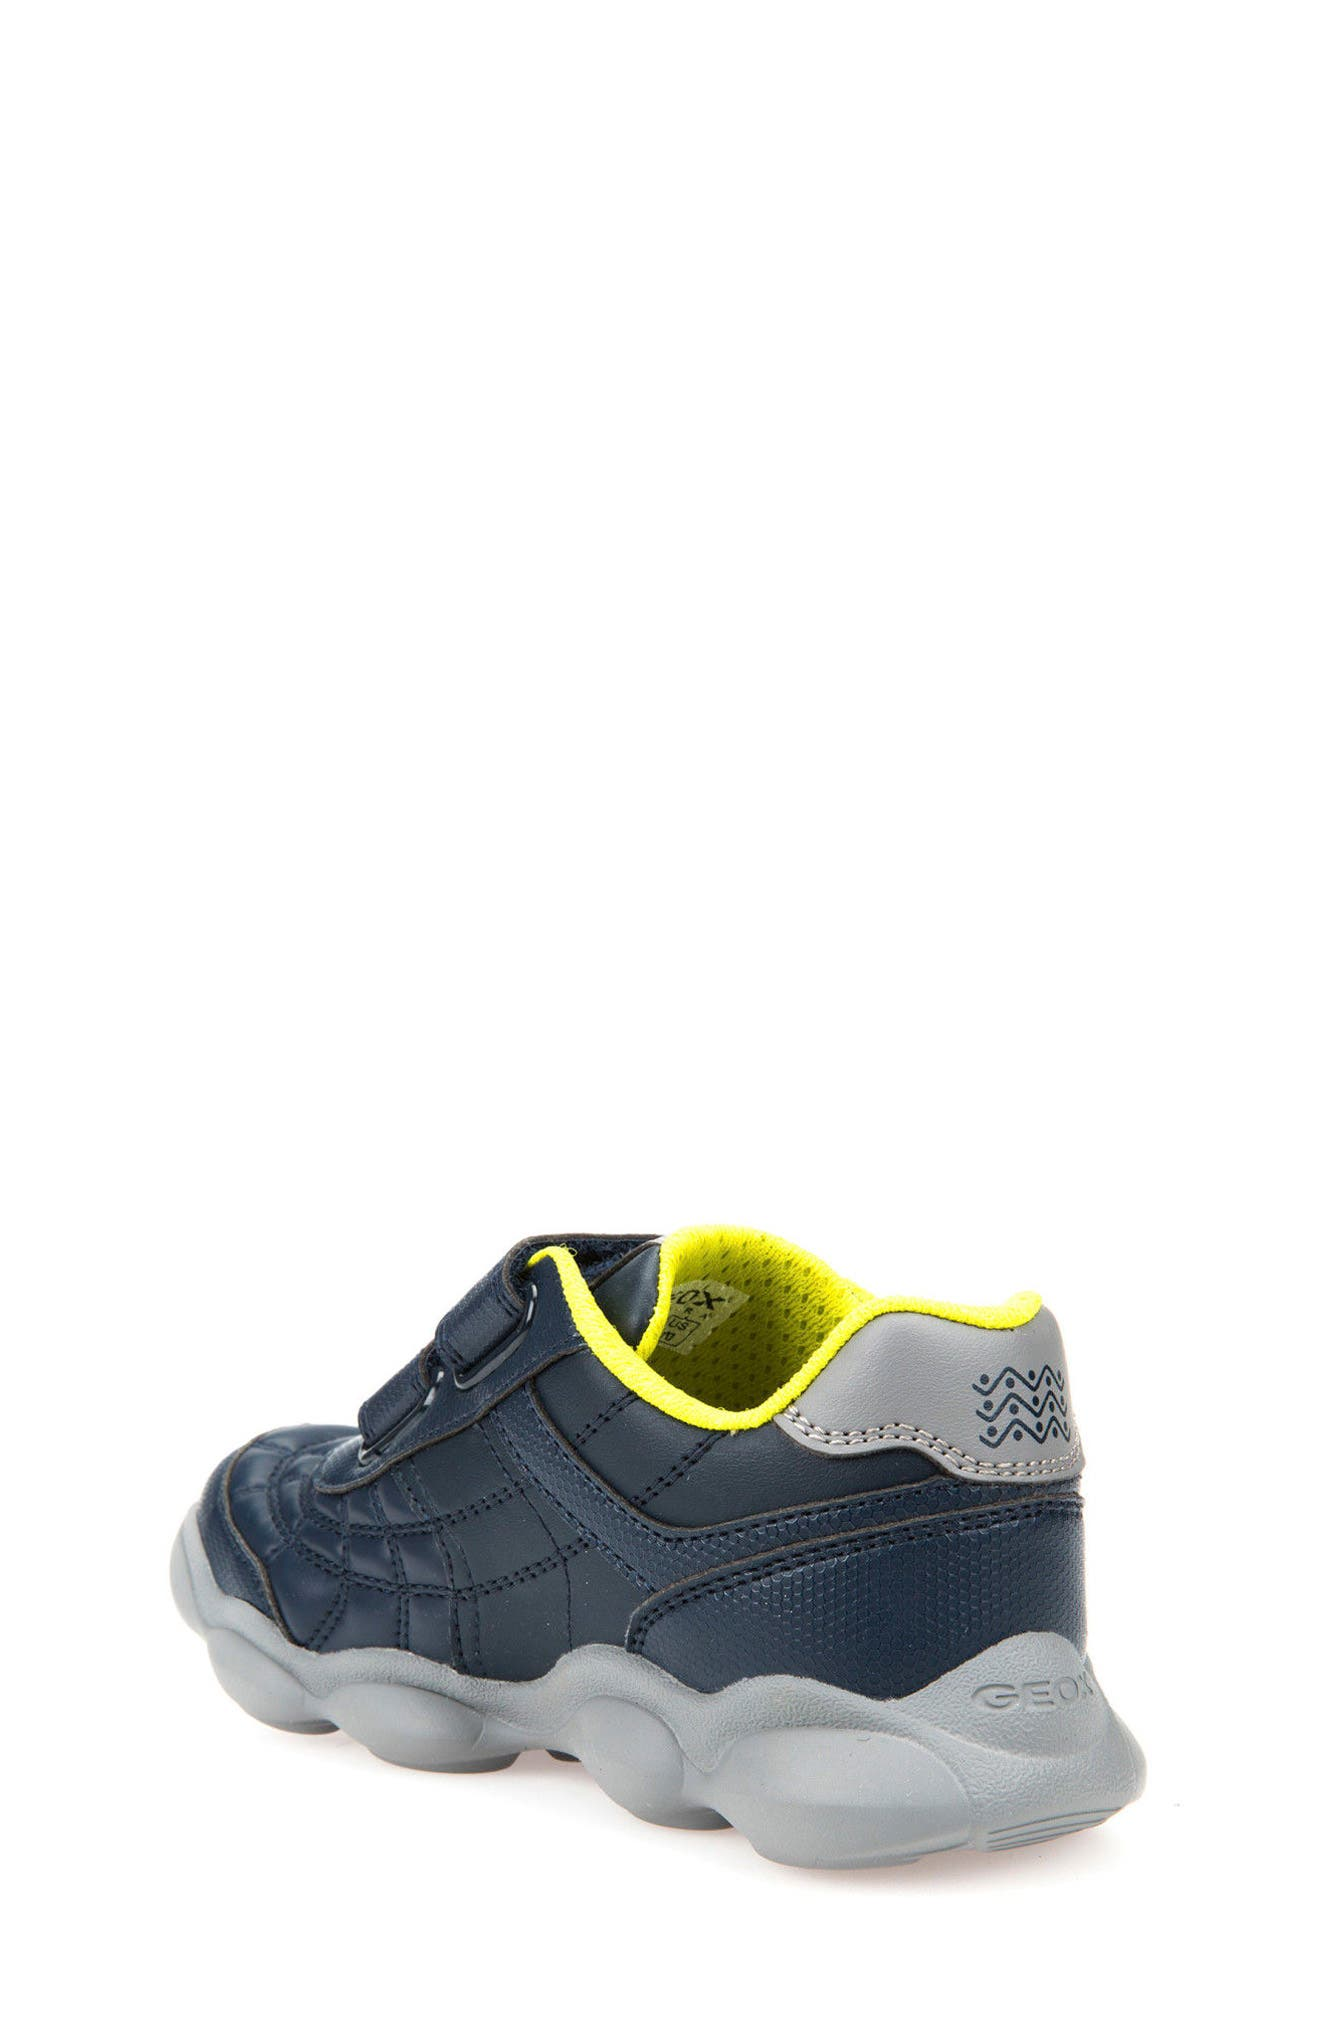 Munfrey Sneaker,                             Alternate thumbnail 2, color,                             Navy/ Grey